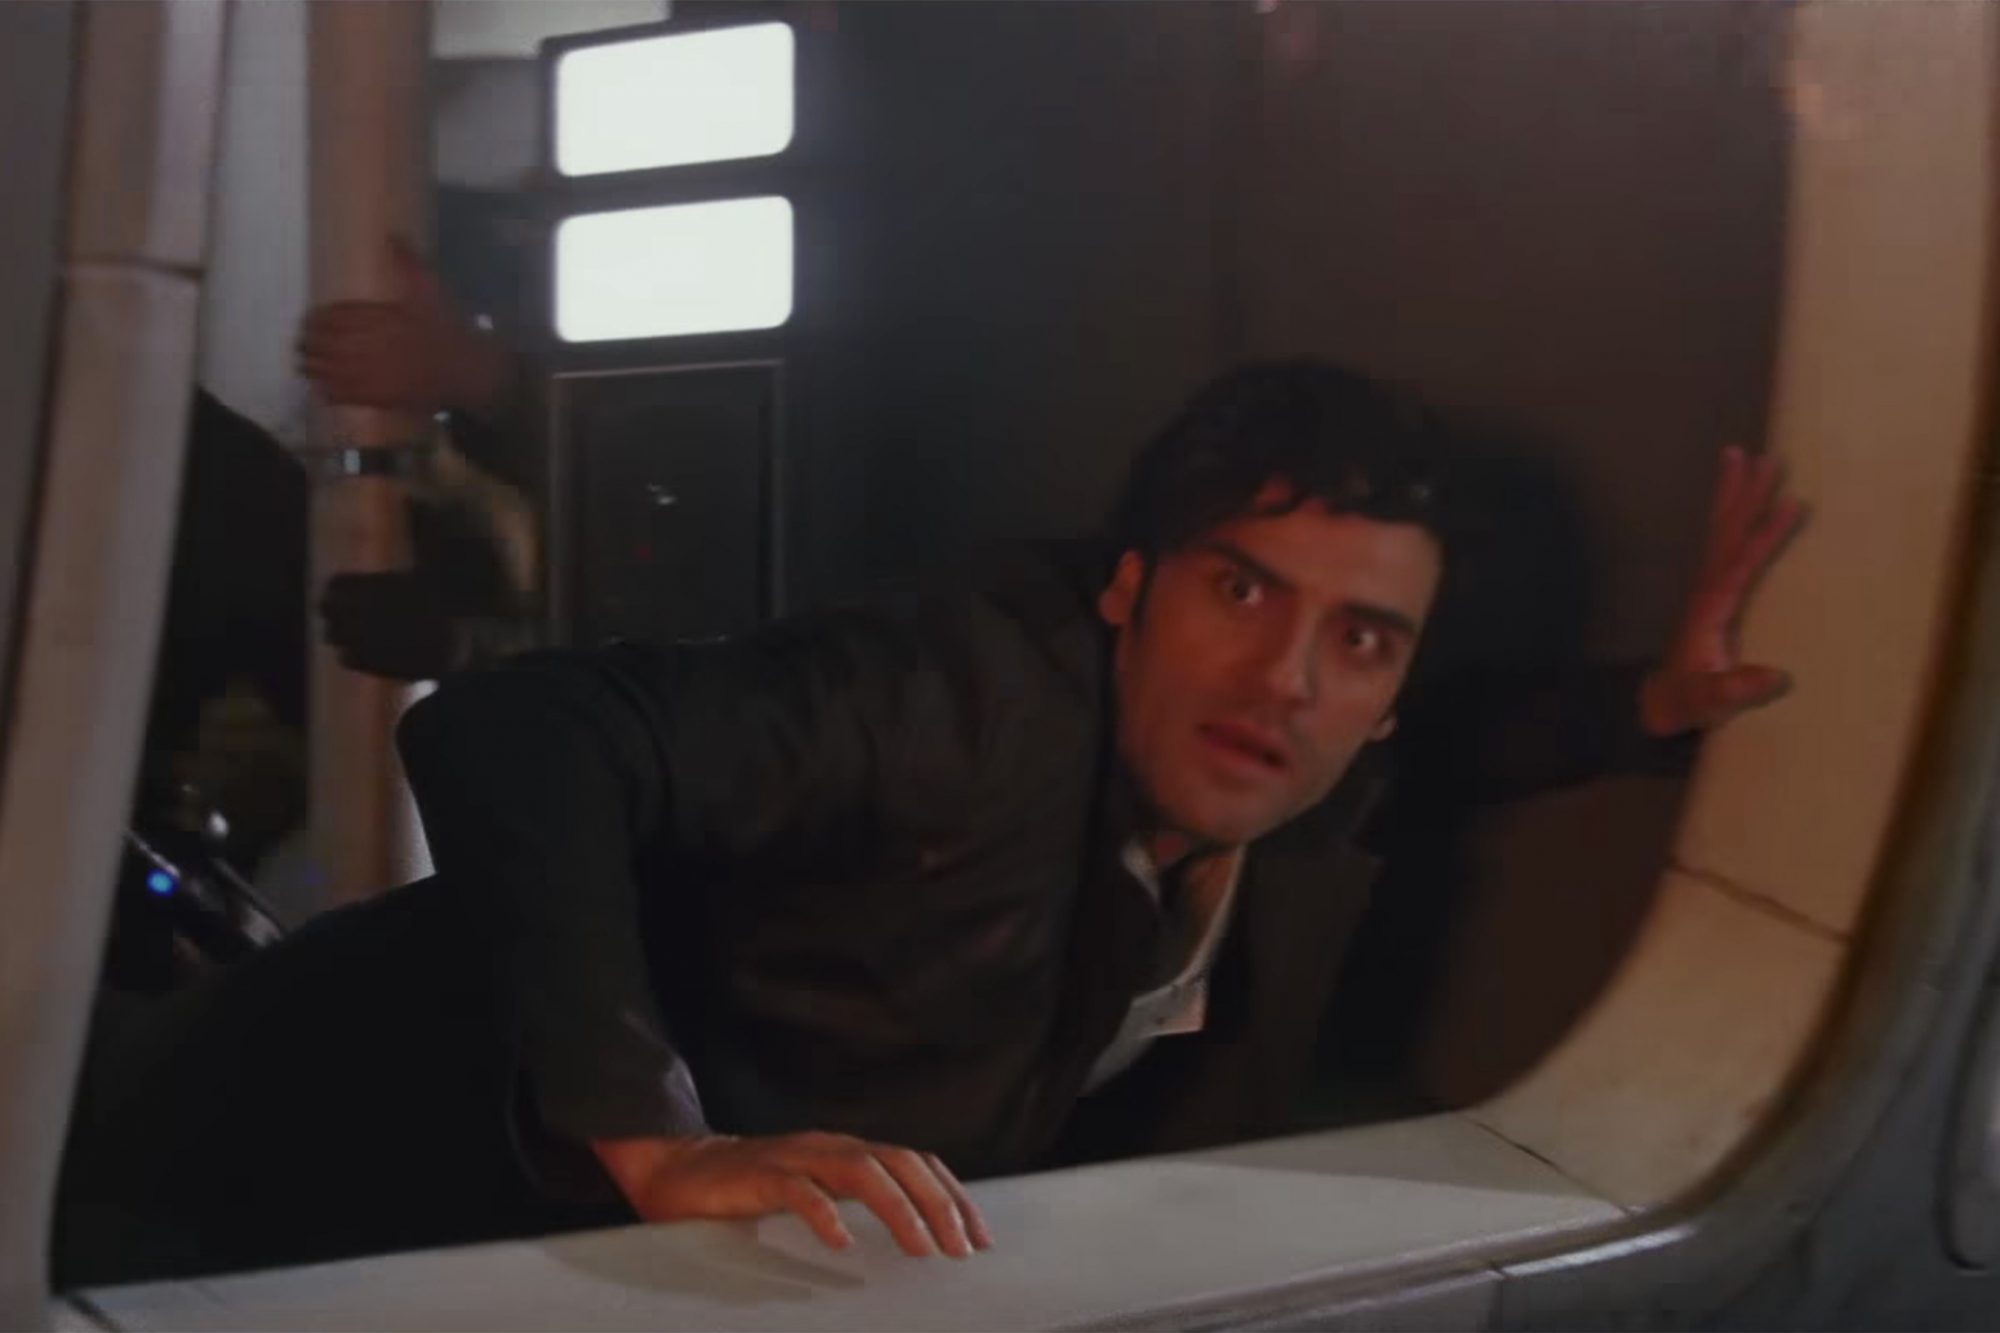 Helpless Poe